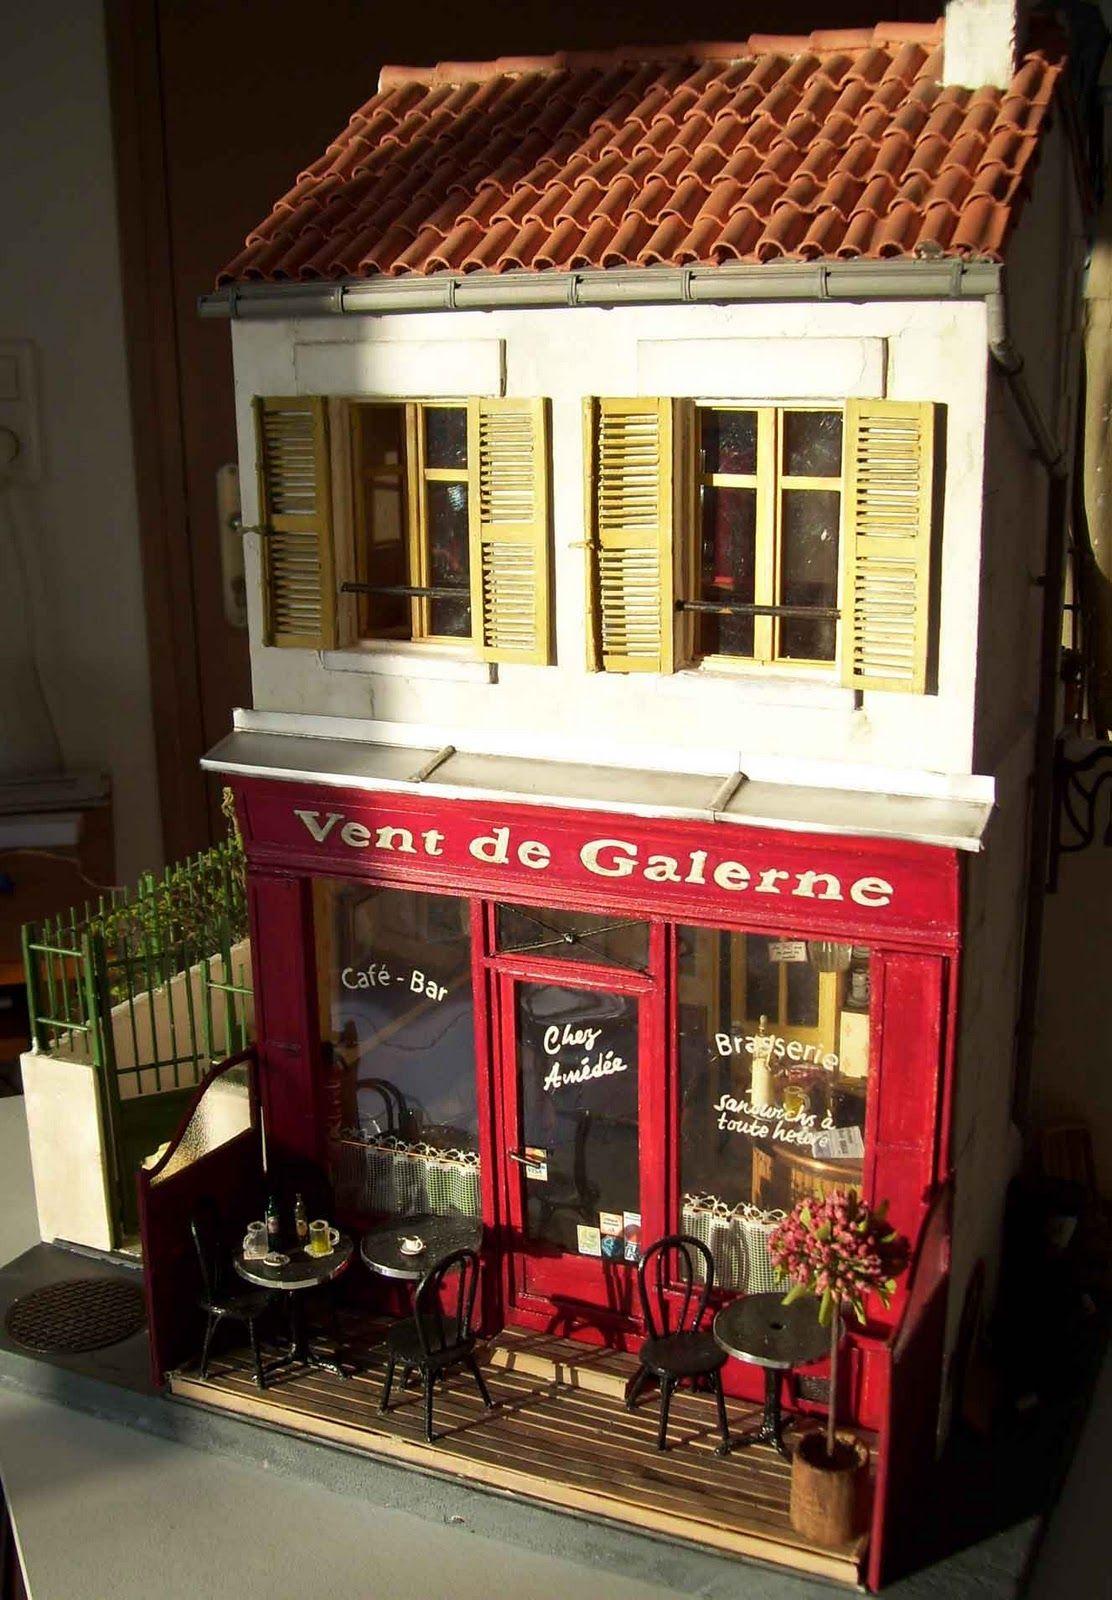 Dolls House Espresso Coffee Machine 1:12th Scale Cafe Kitchen Miniature